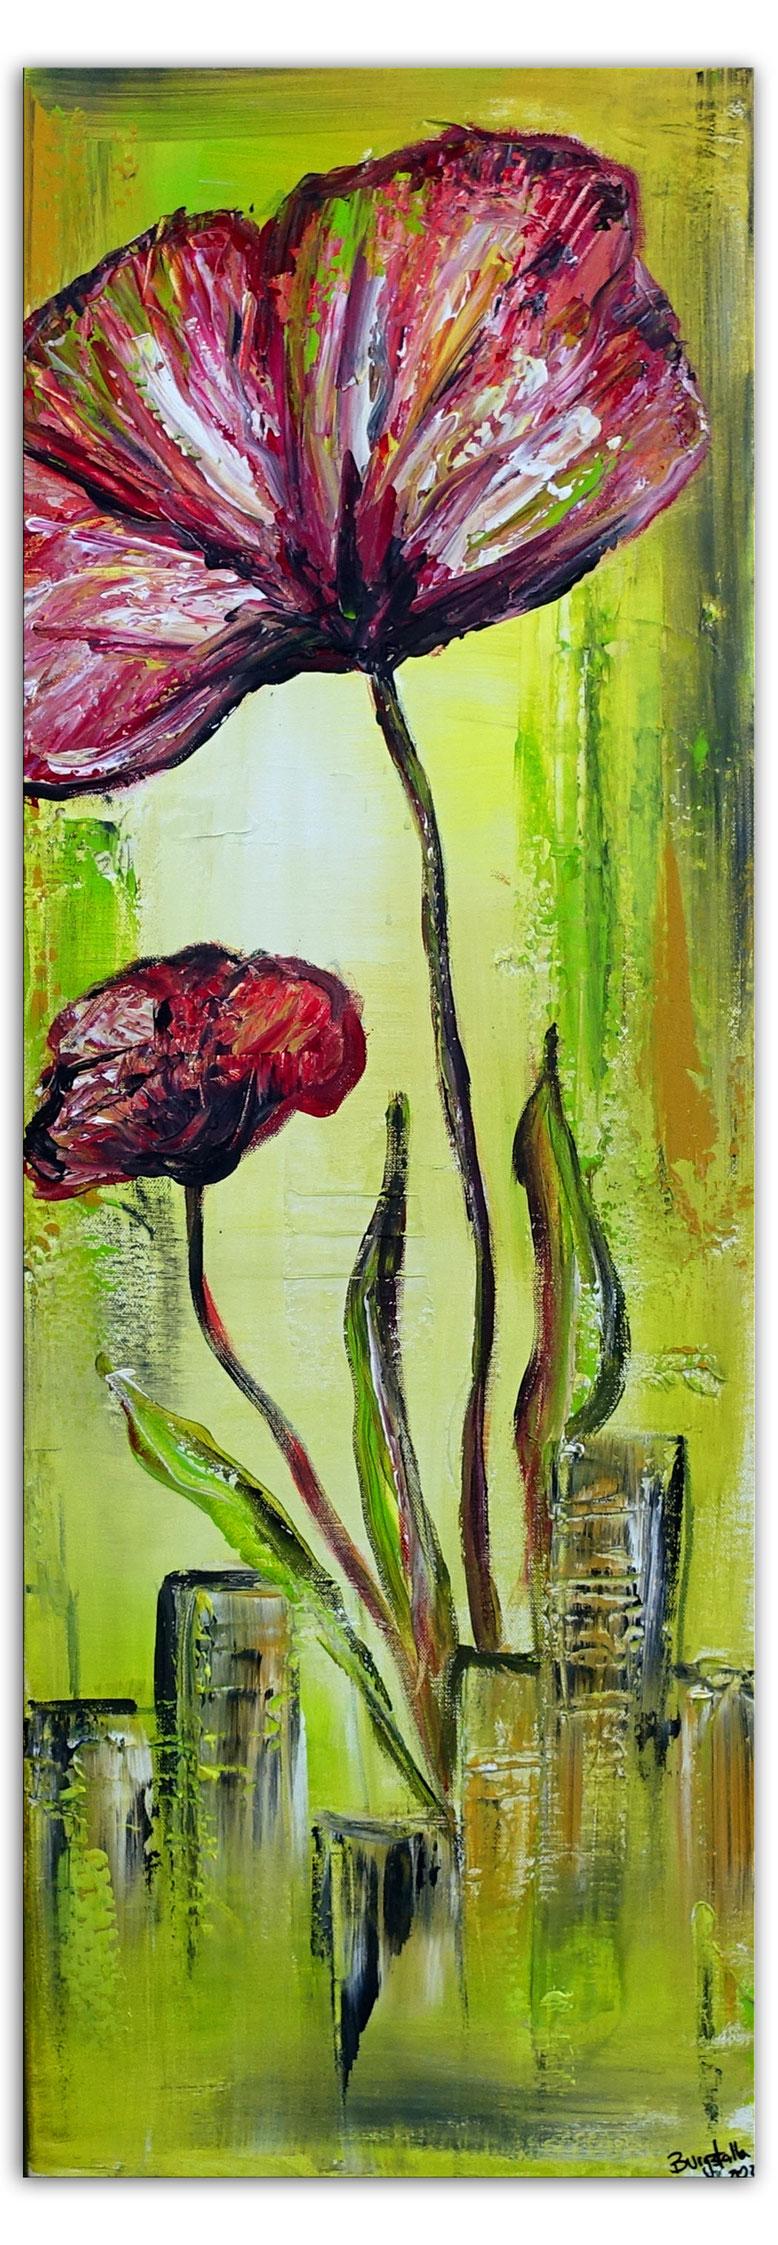 Blütenmeer Blumen Malerei Gemälde Blüten pastell blau ocker rose unikat Acrylbild 70x90